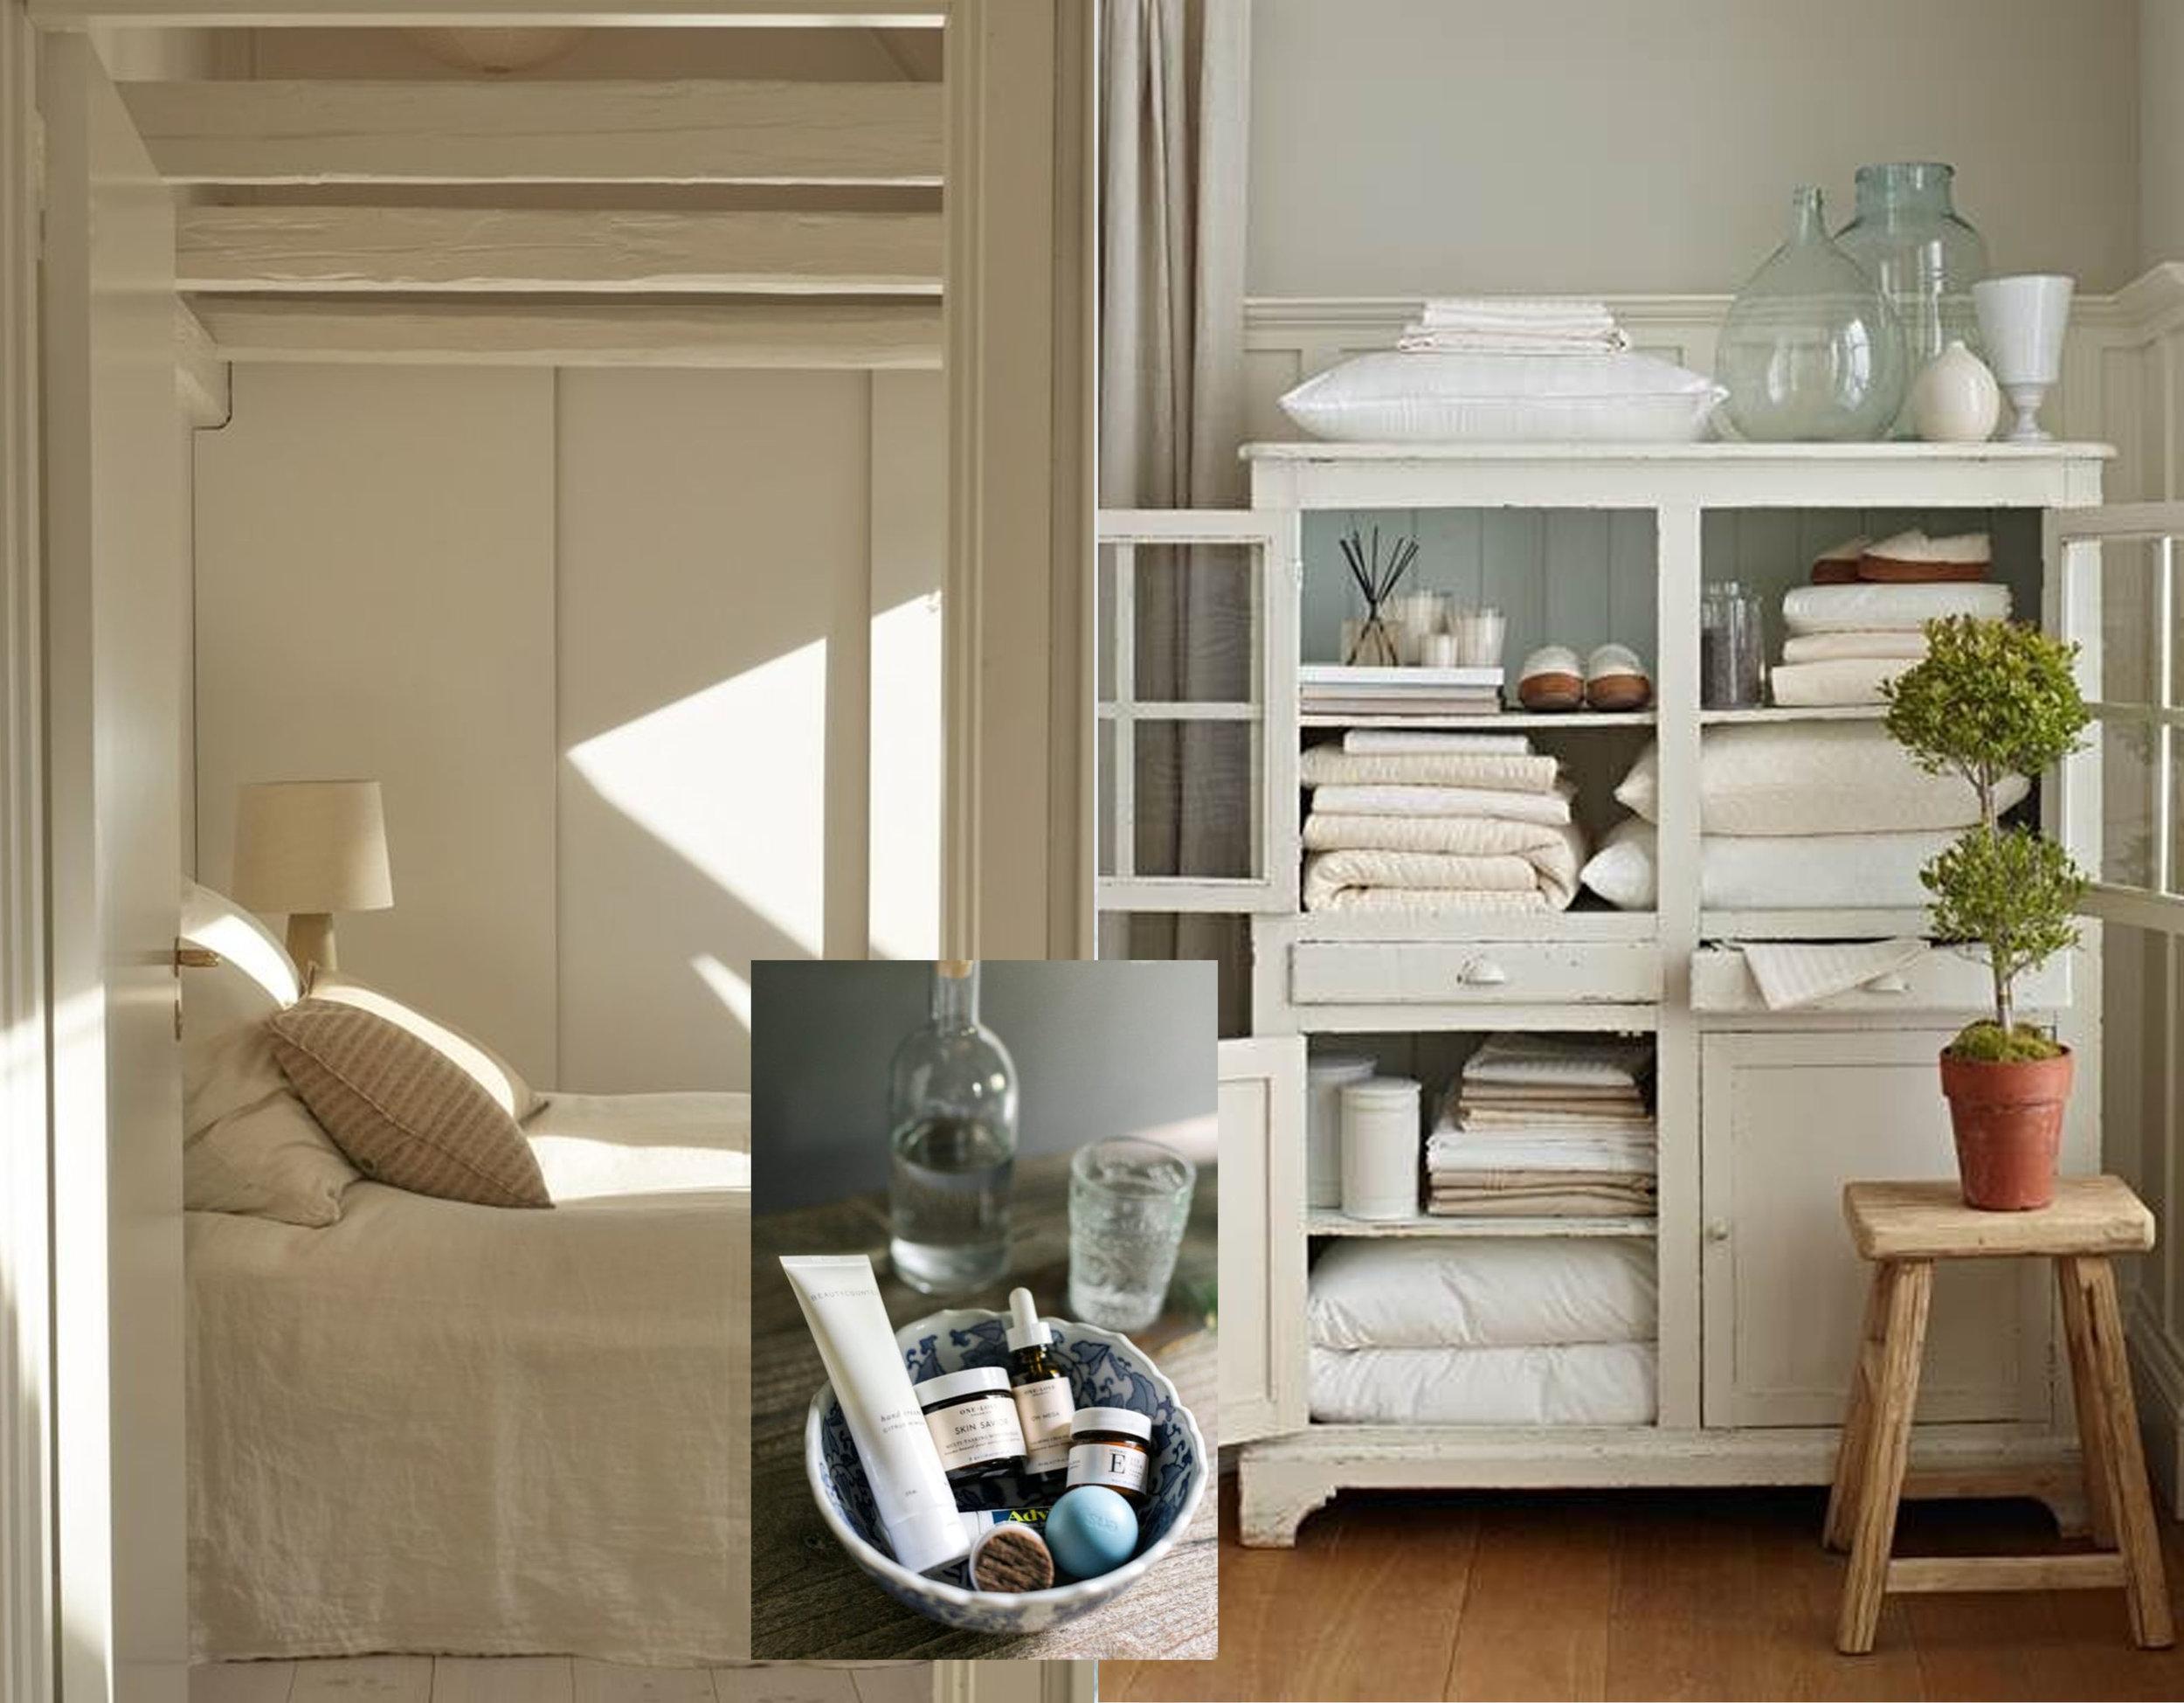 bedroom via  Remodelista  - storage via  Liz Marie  - nightstand essentials via  Waiting on Martha